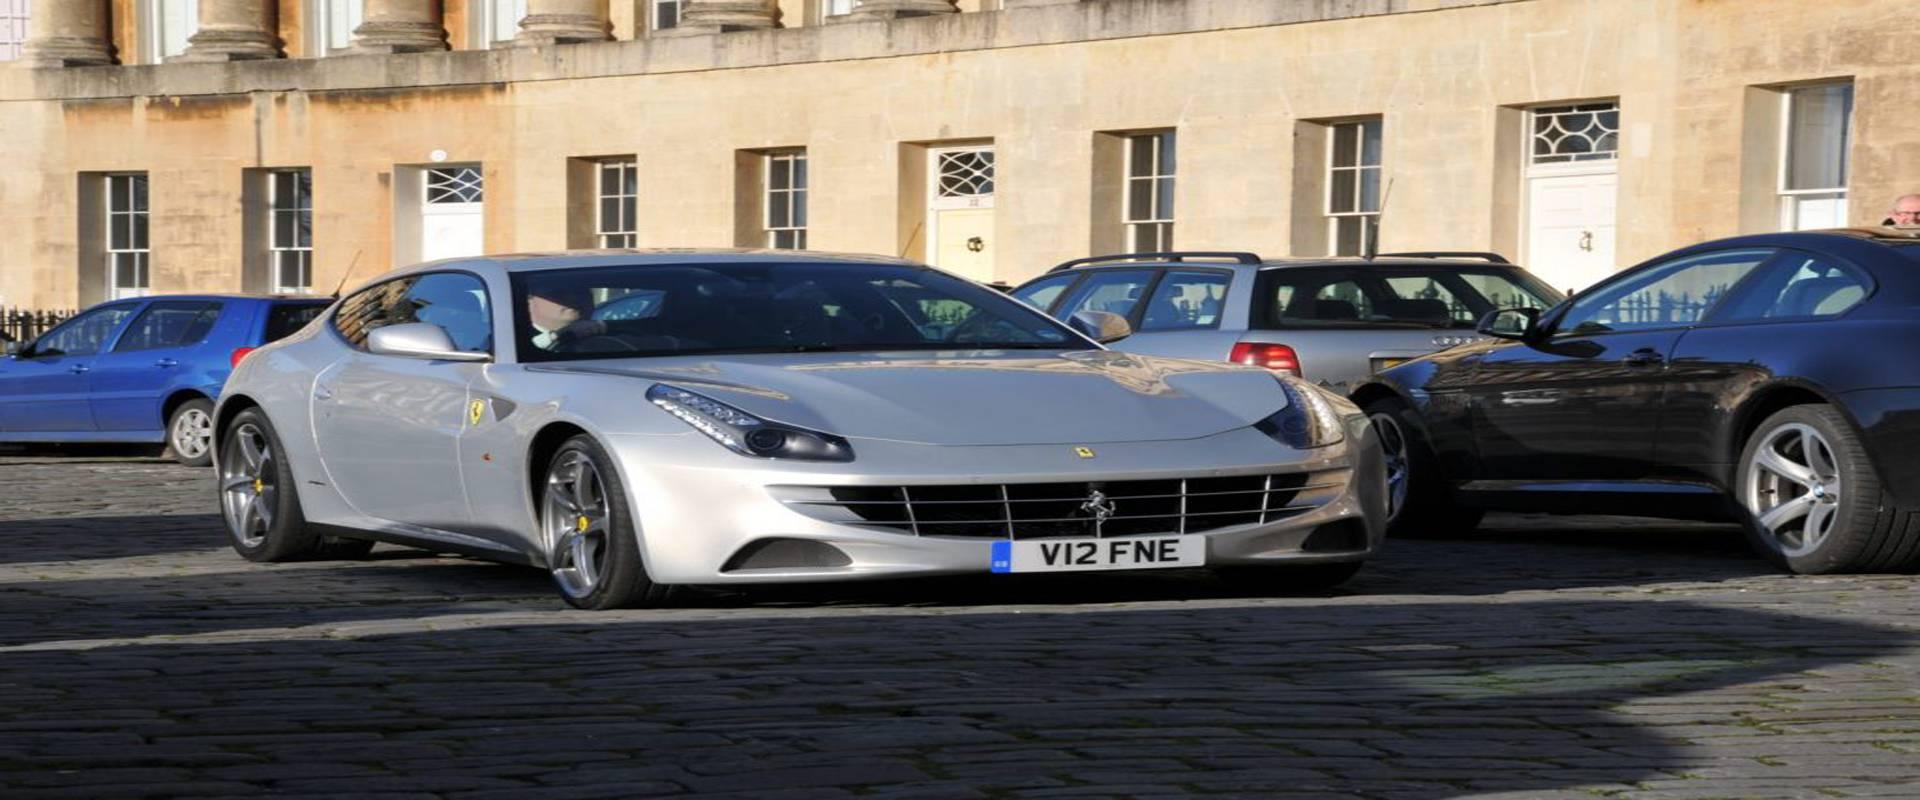 Weekend with a Ferrari FF